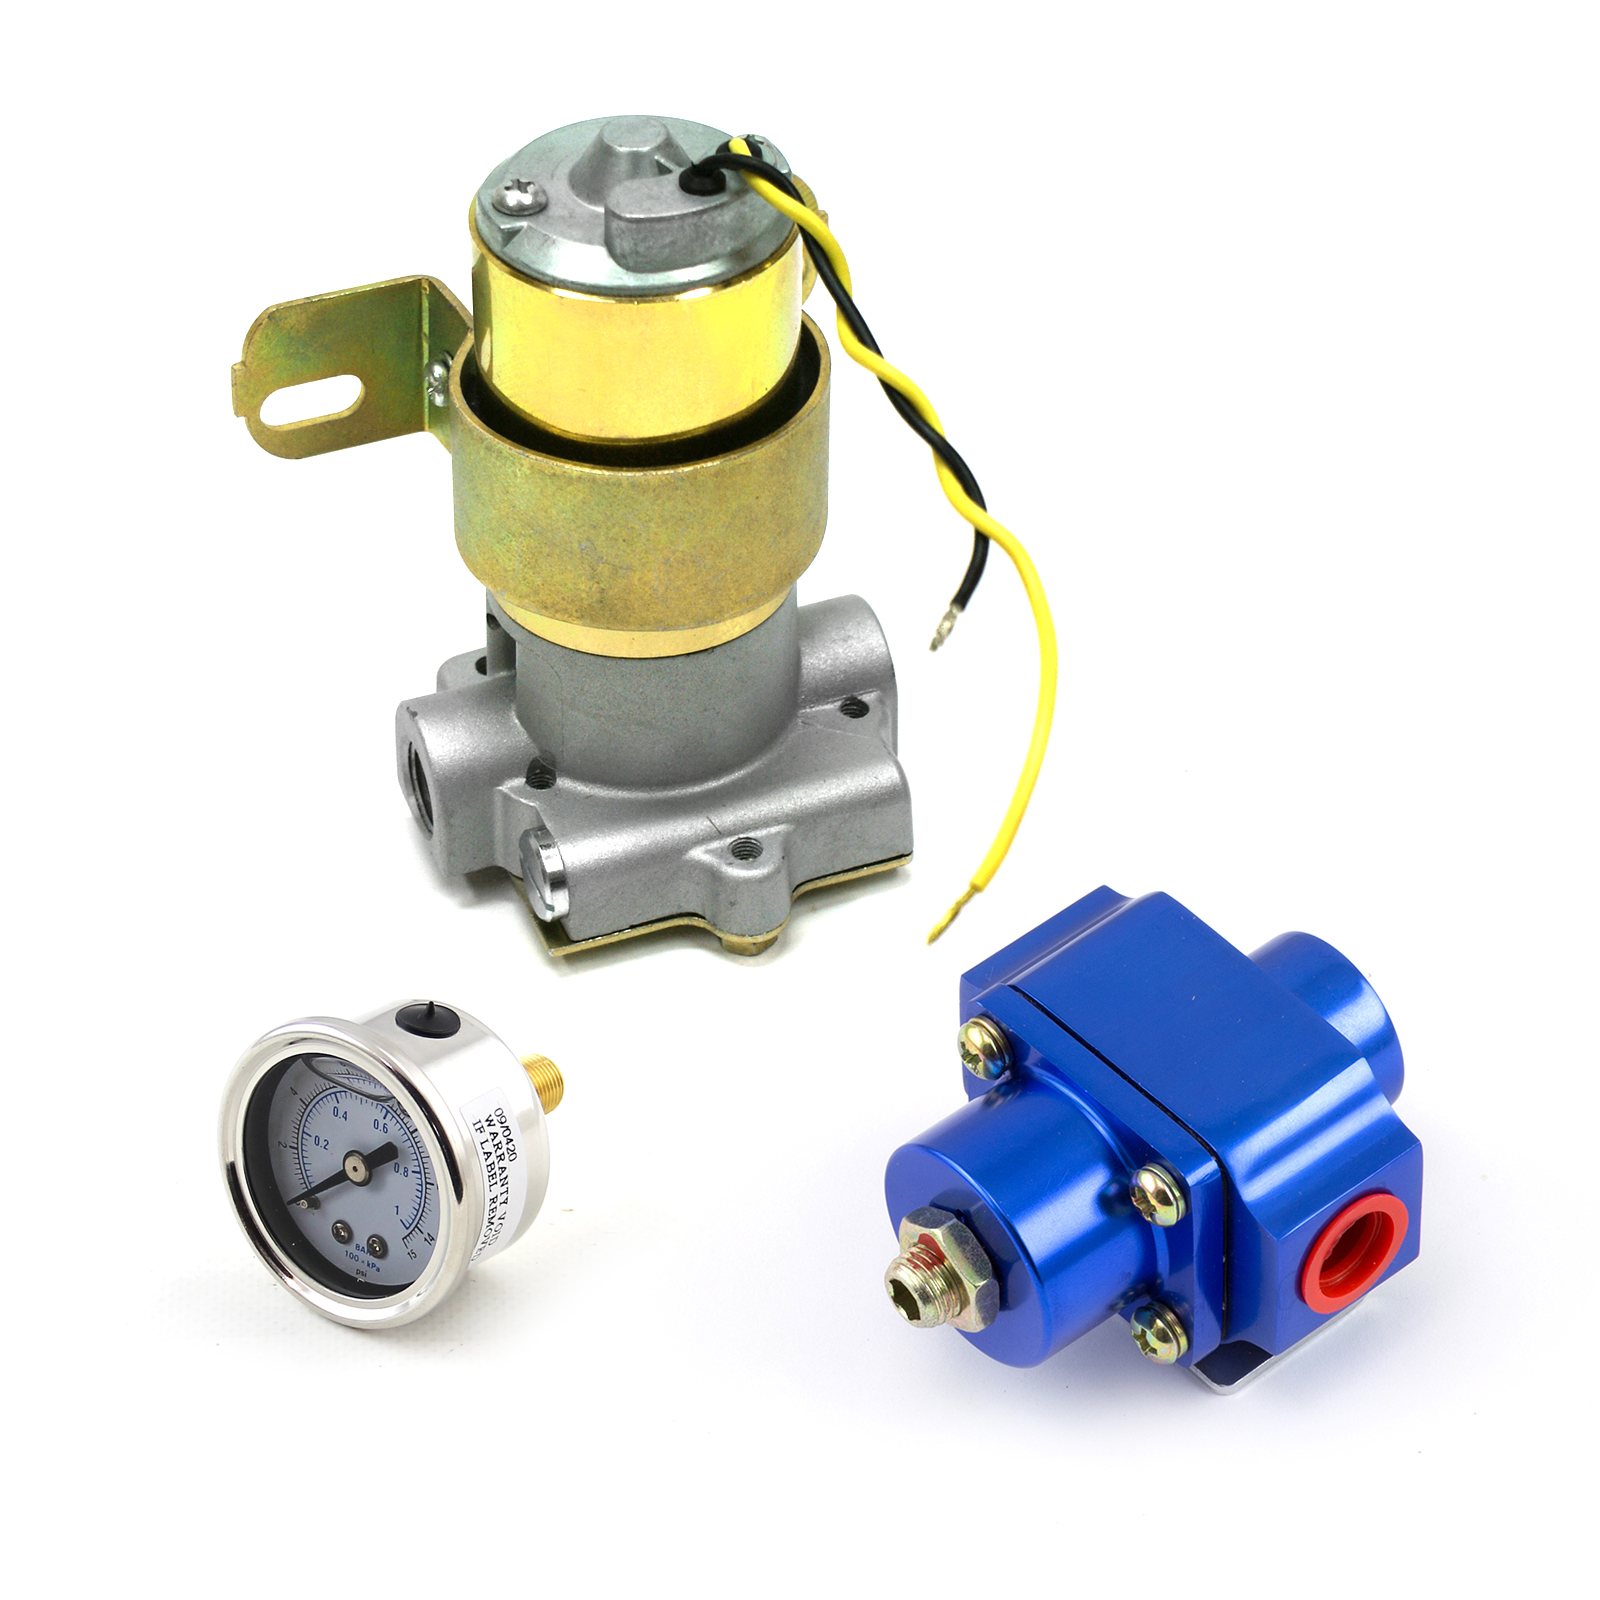 95 Gph Universal Electric Fuel Pump Blue Regulator & Gauge Combo Kit